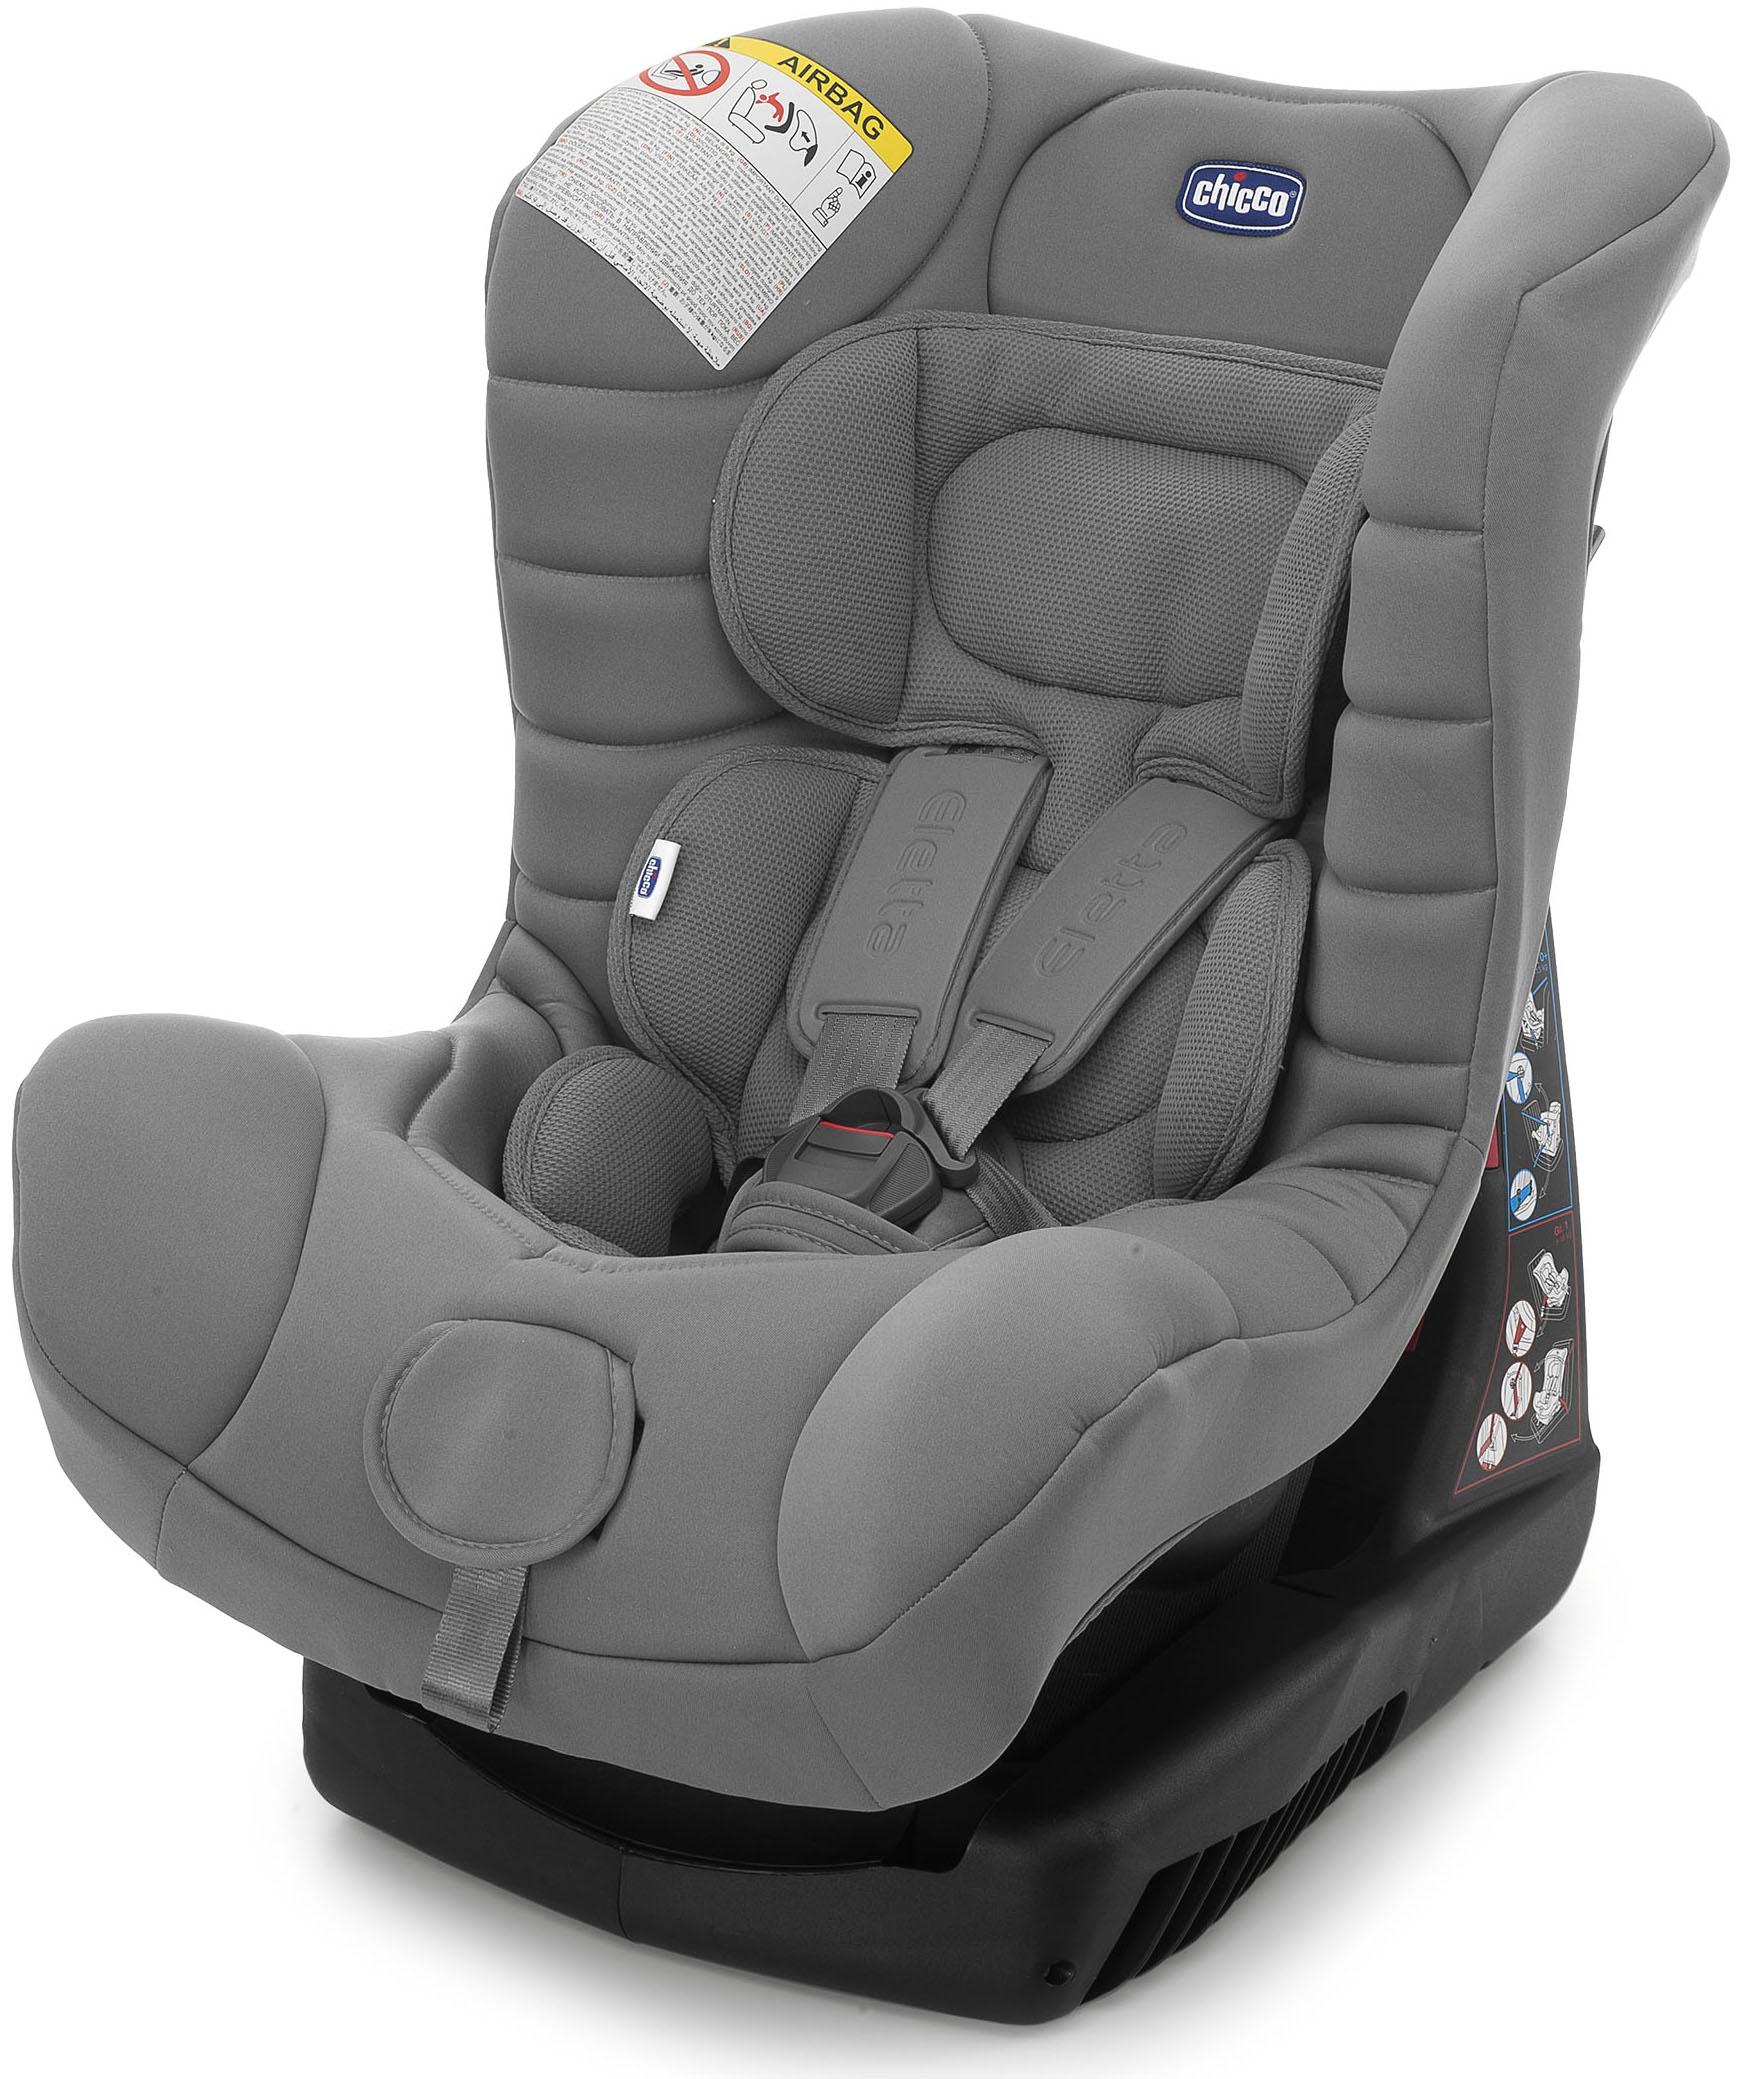 Автокресла группа 0+/1 (до 18 кг) CHICCO Автокресло Chicco «Eletta Comfort» 0-18 кг Grey автолюльки